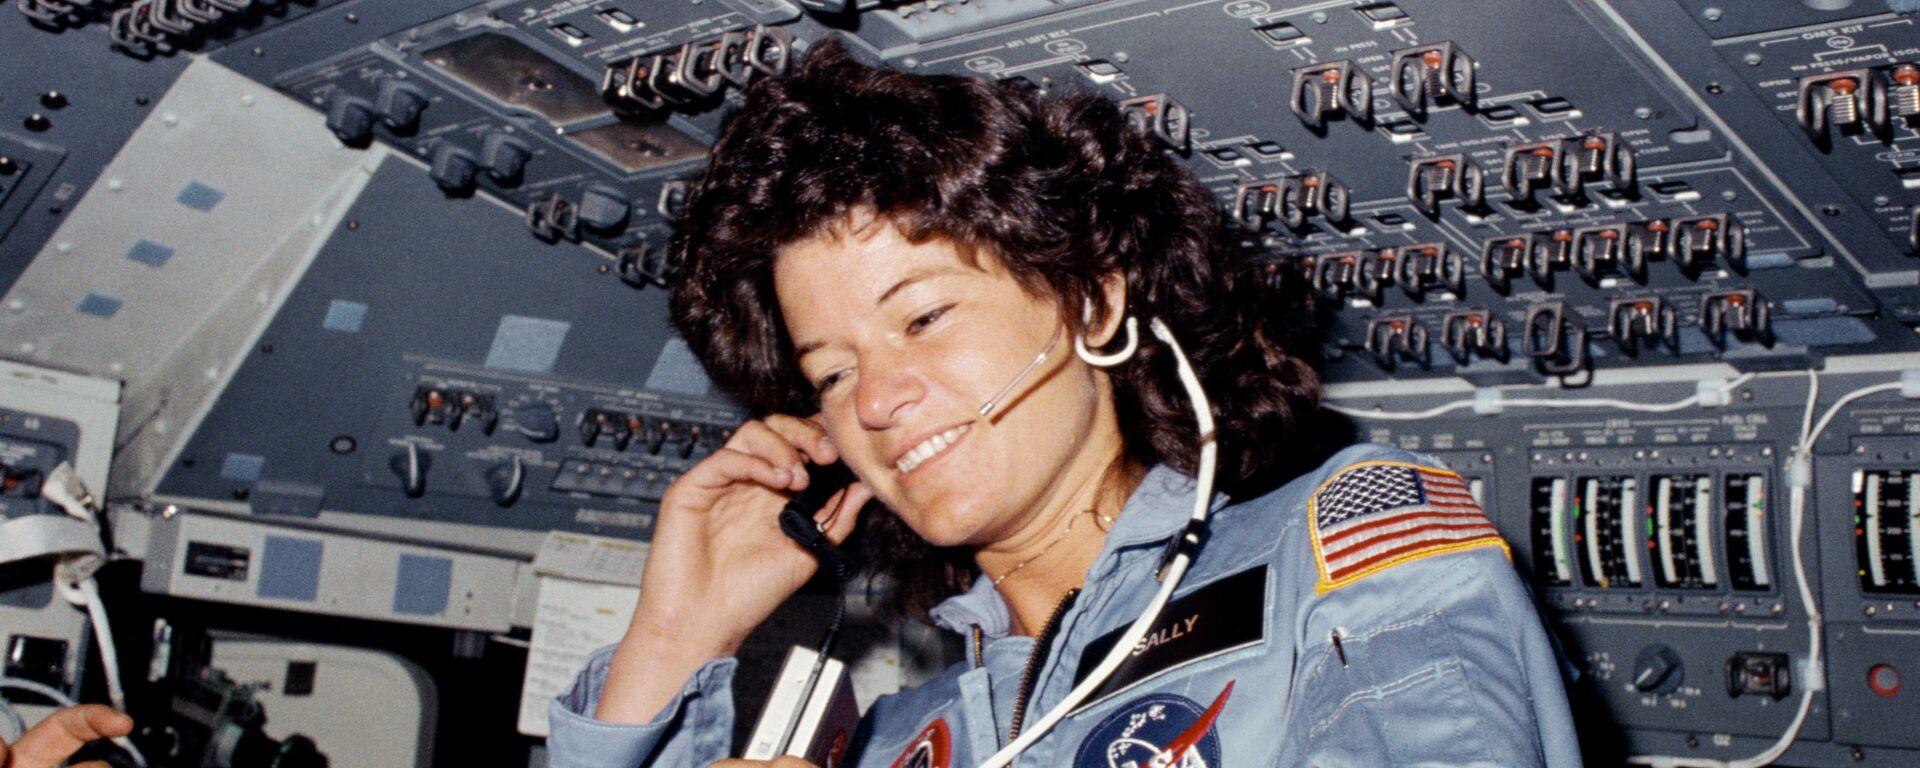 Sally K. Ride, astronauta estadounidense - Sputnik Mundo, 1920, 19.04.2021